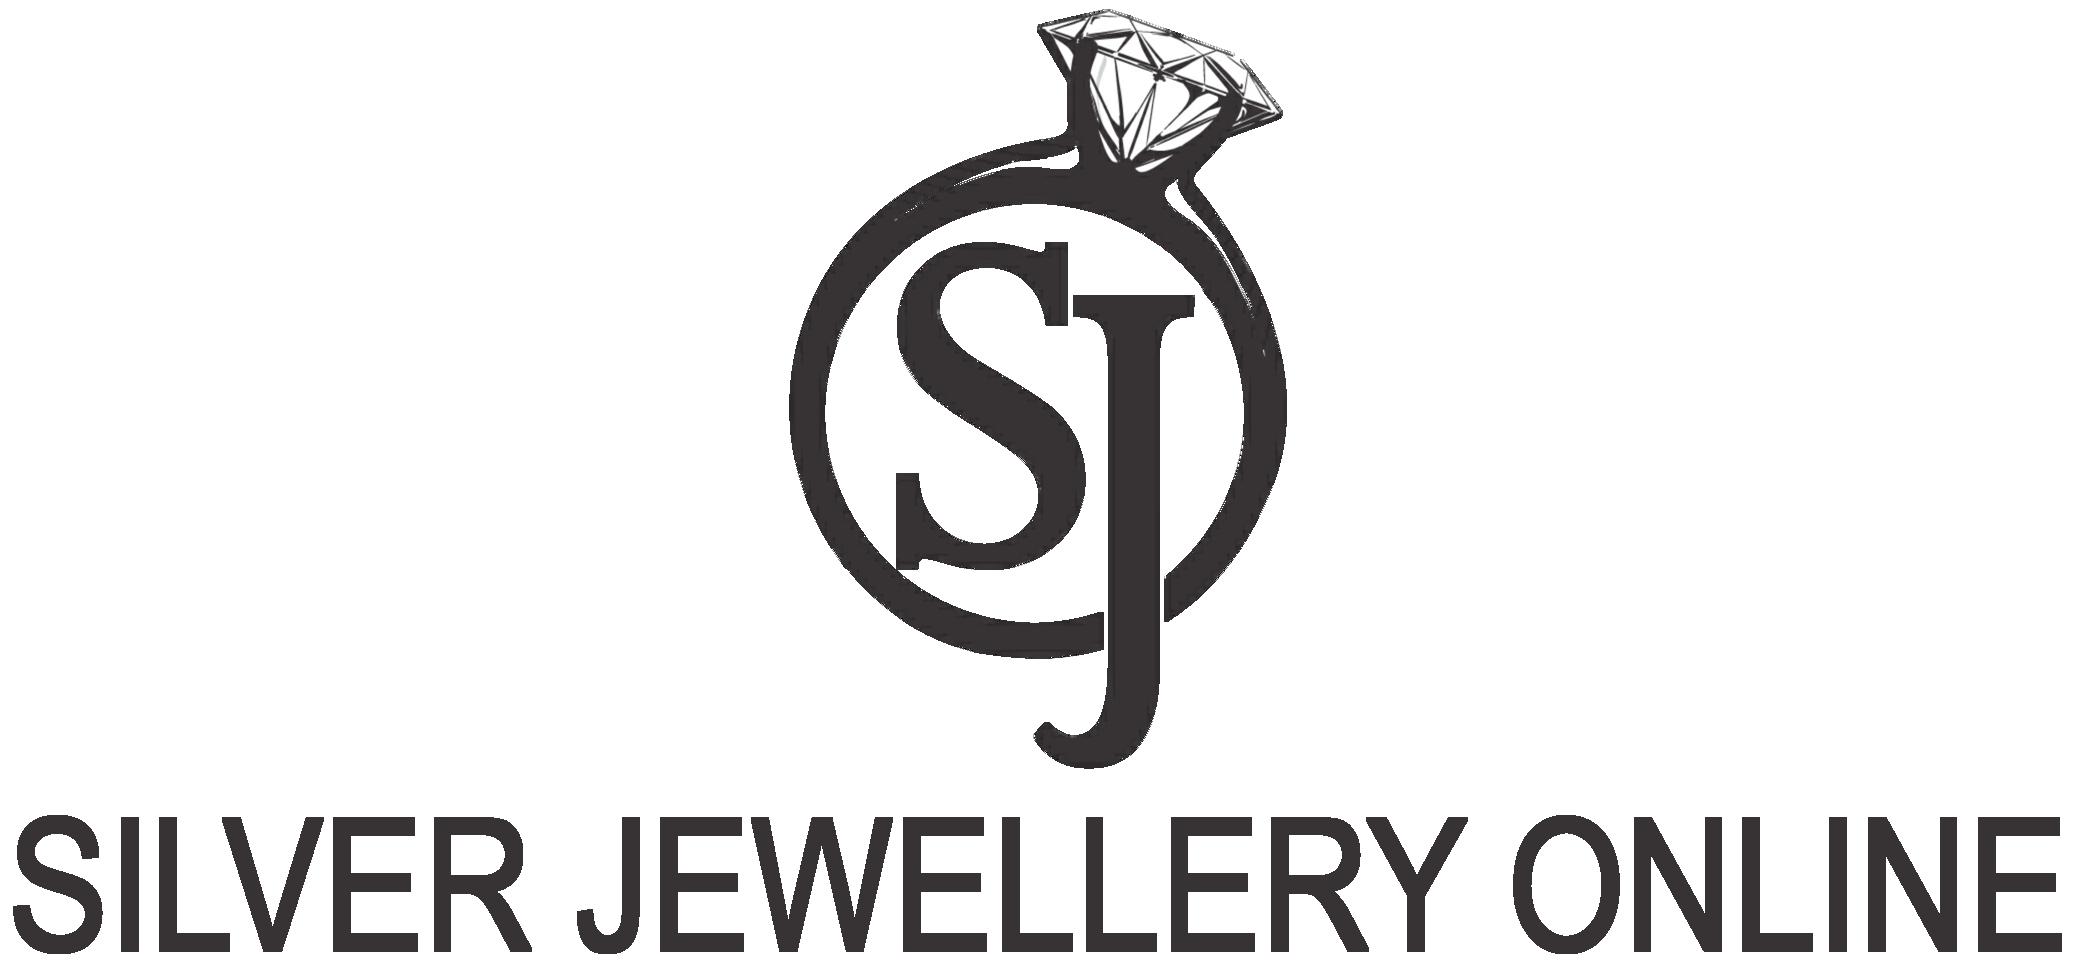 Silver online buy . Ornament clipart jewellery logo